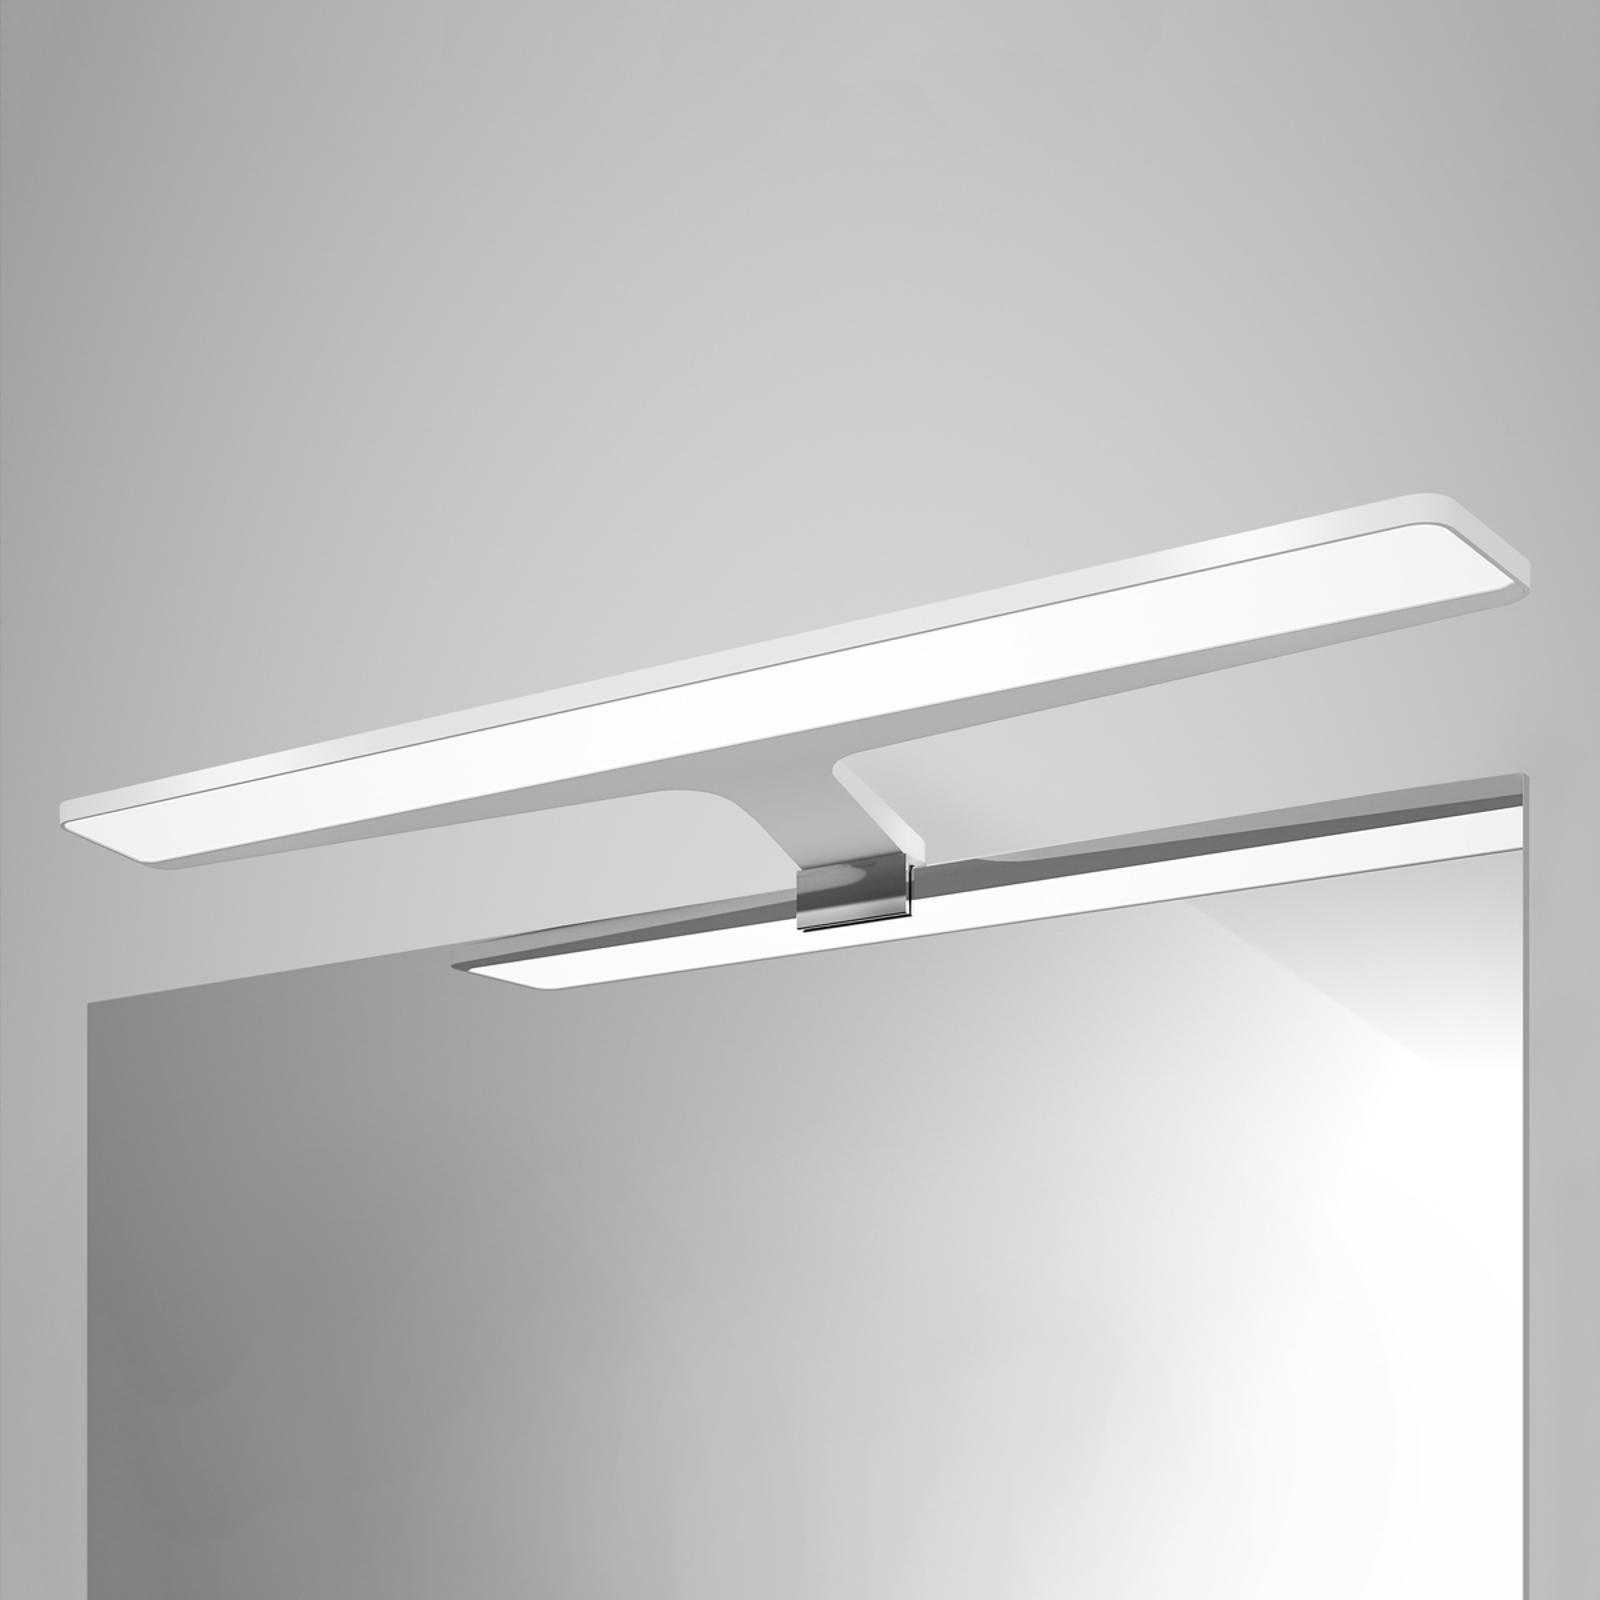 Nayra - vit LED-spegellampa